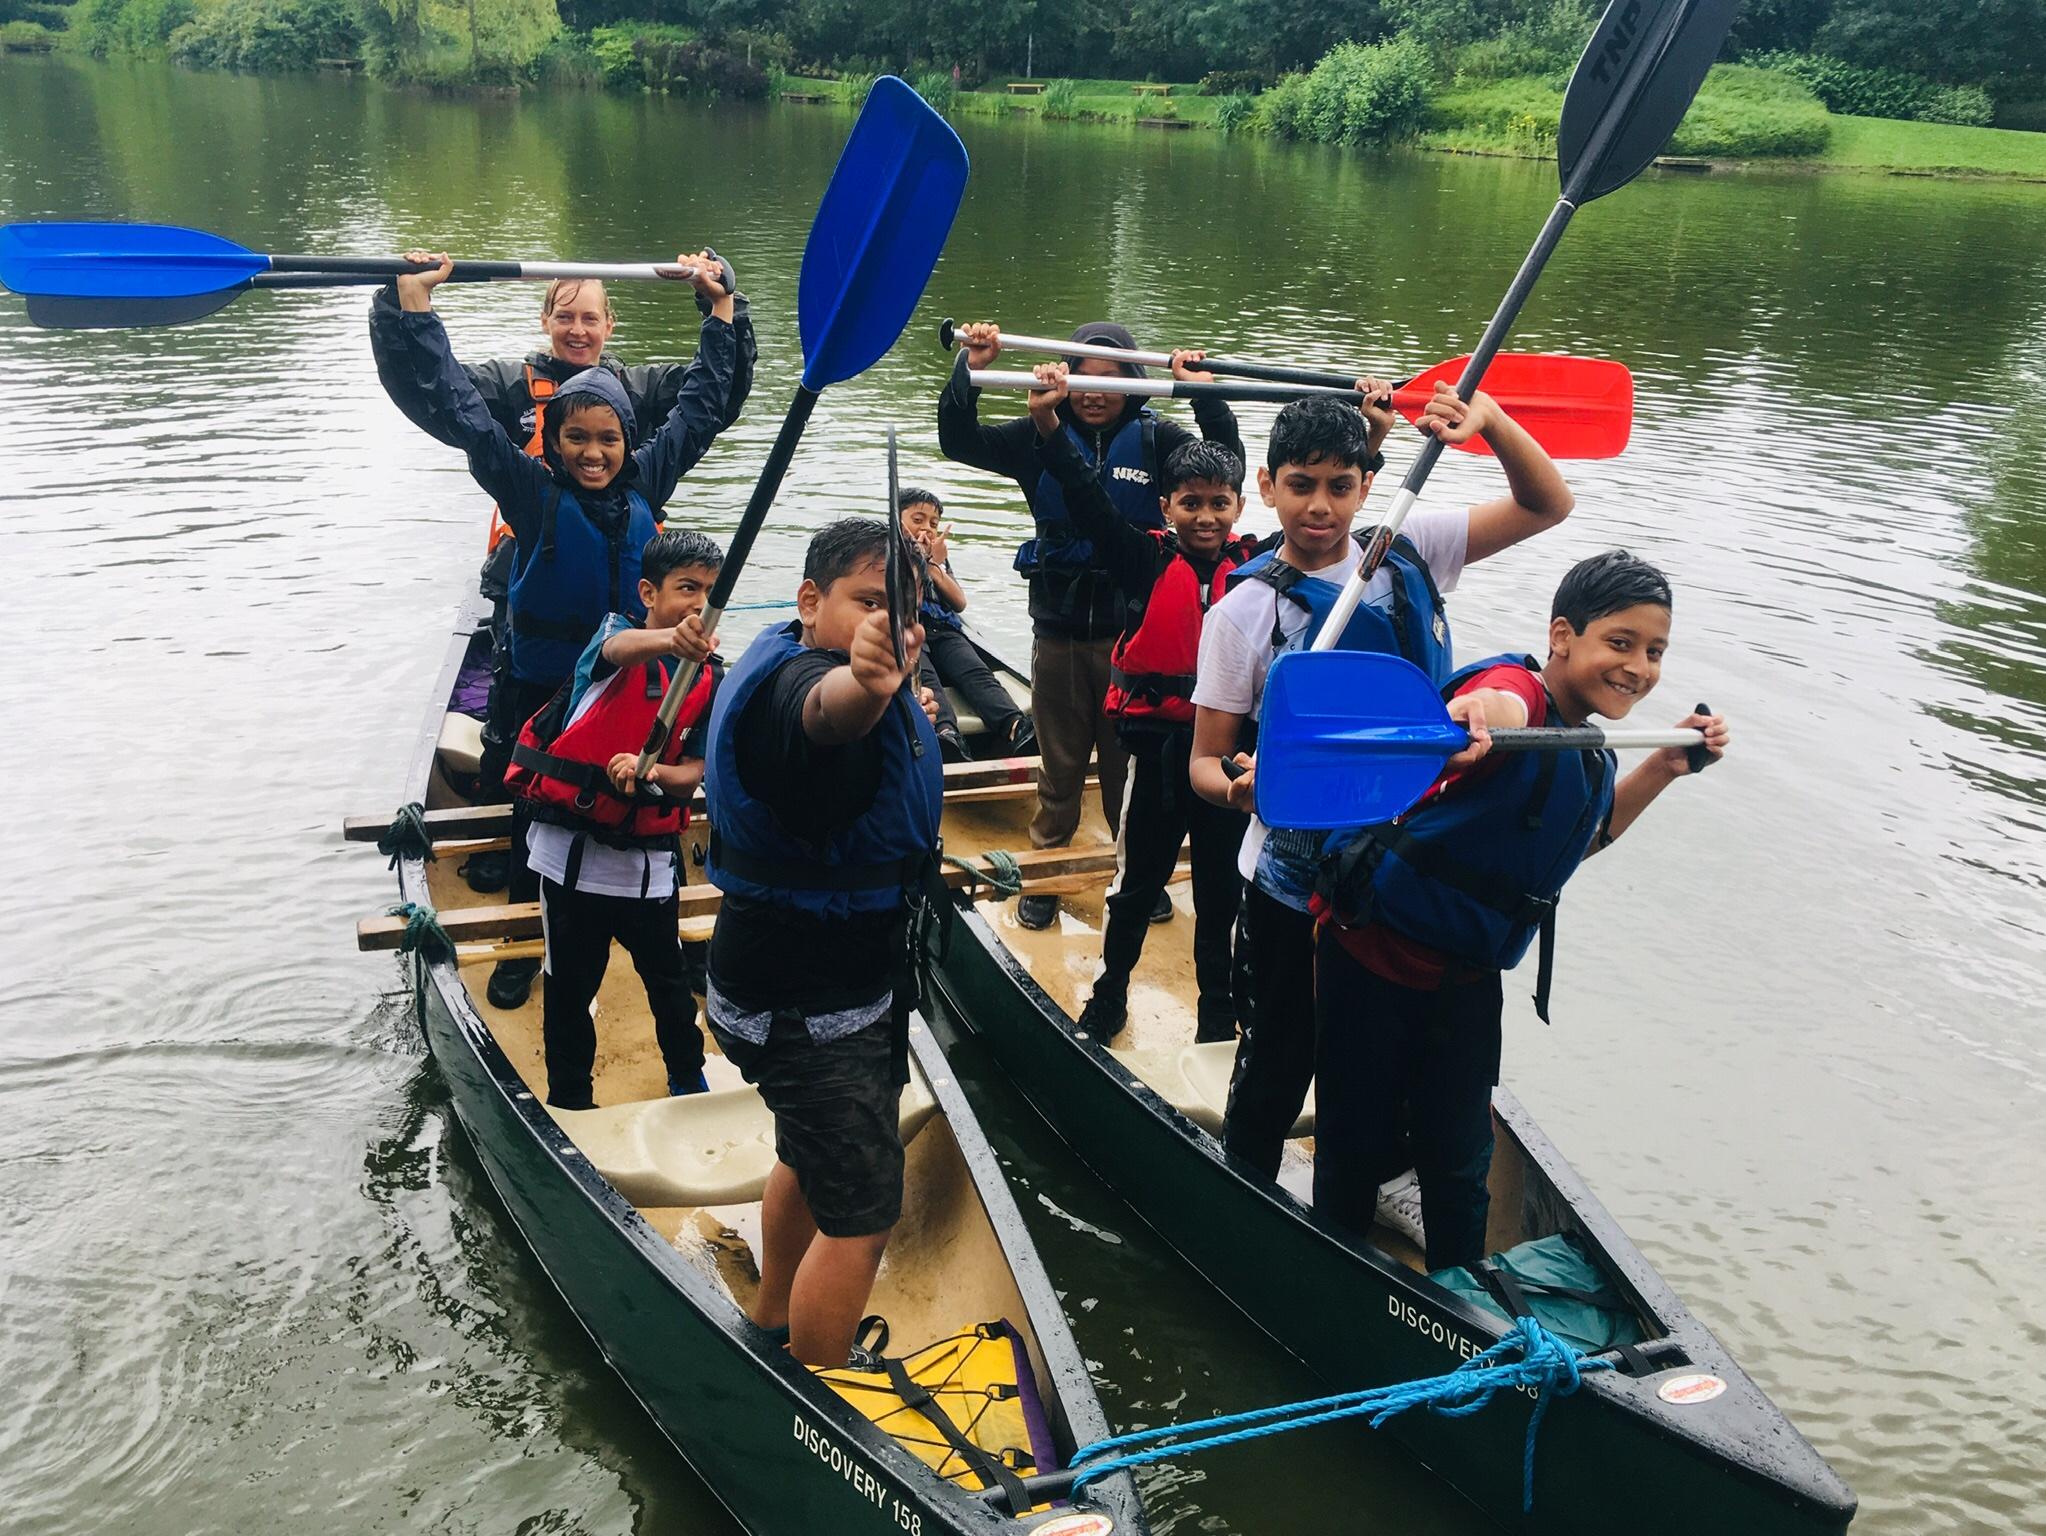 Canoeing in Alexandra Park